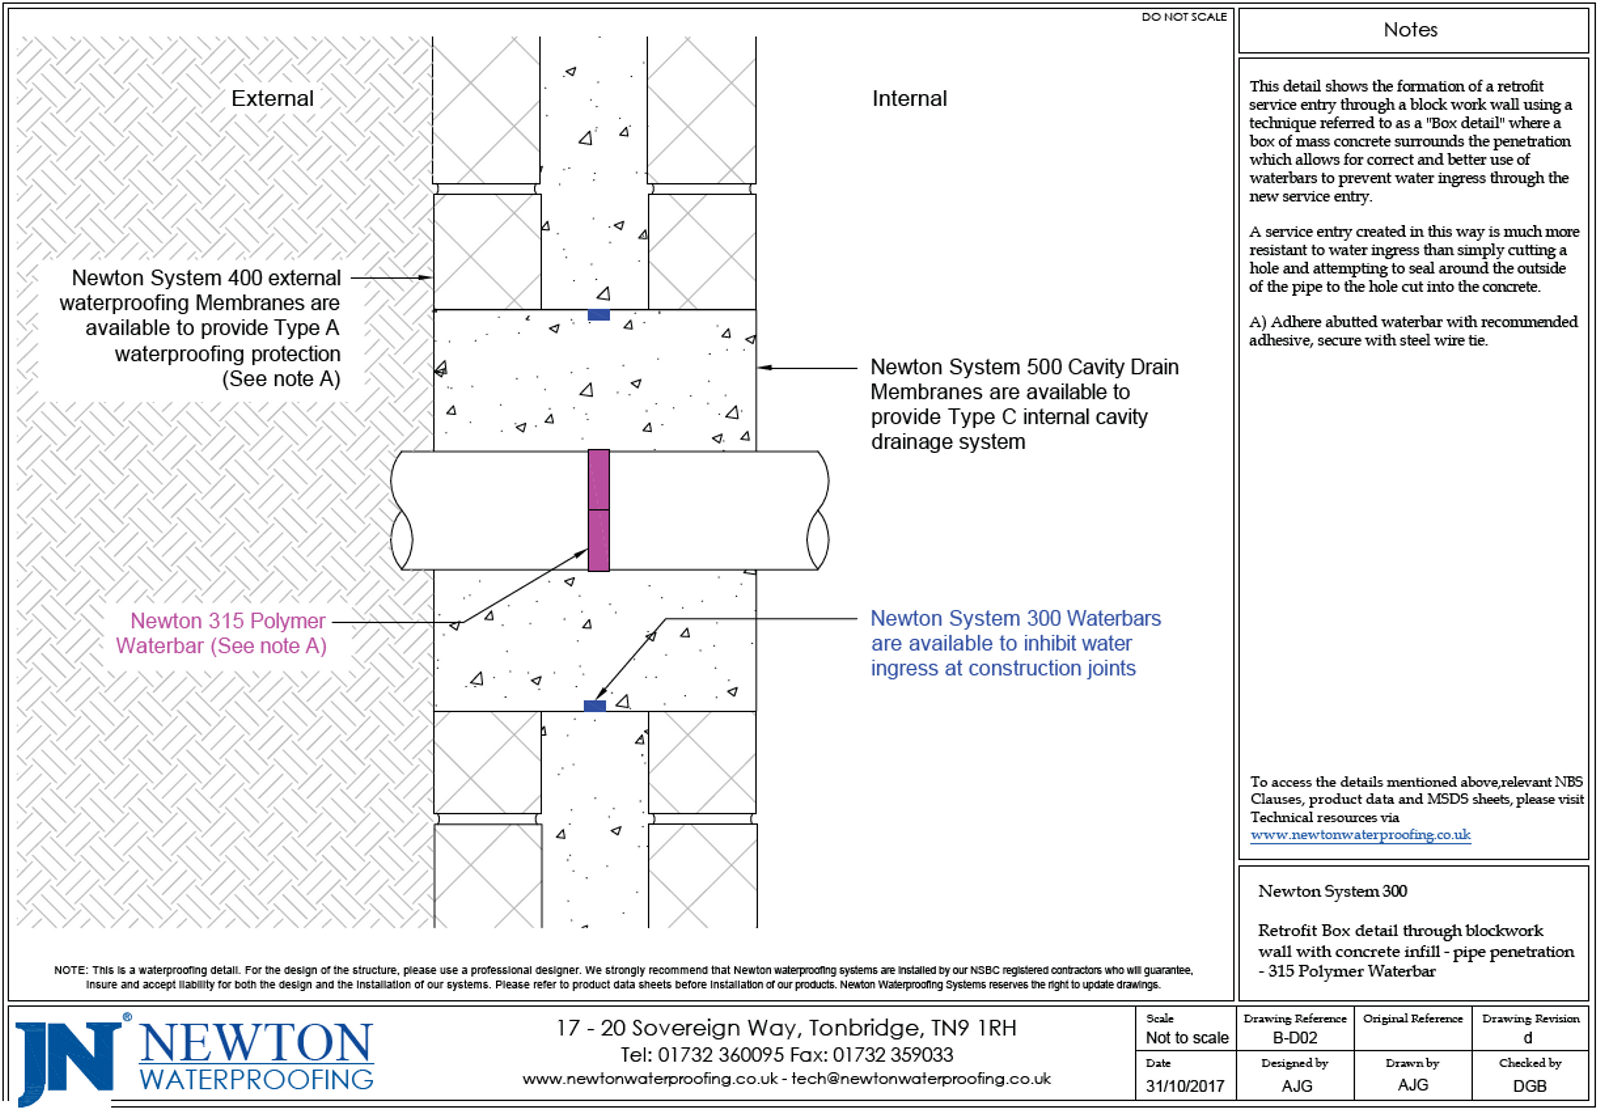 Technical Drawing - Retrofit box detail through blockwork wall